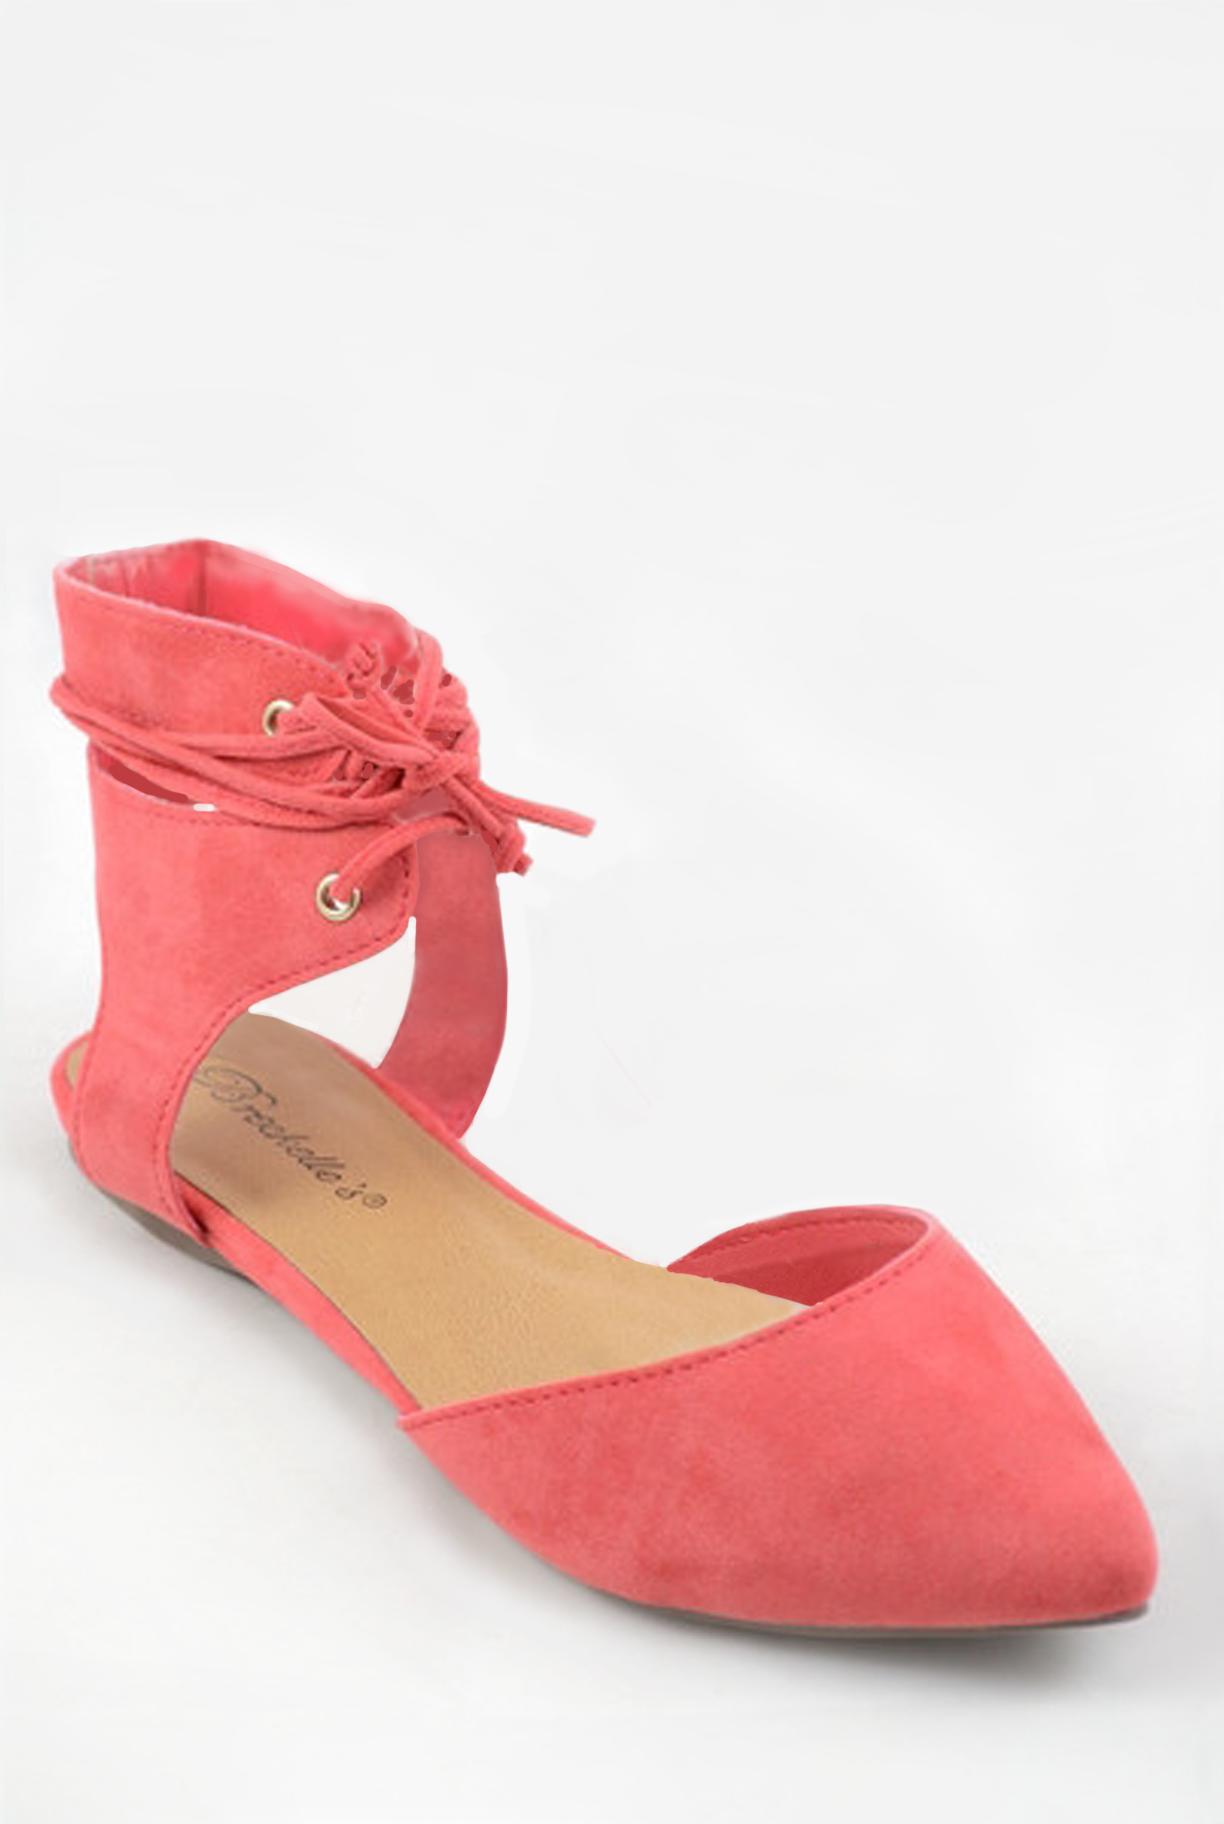 'Safety Dance' Ballet Shoe 'Safety Dance' Ballet Shoe